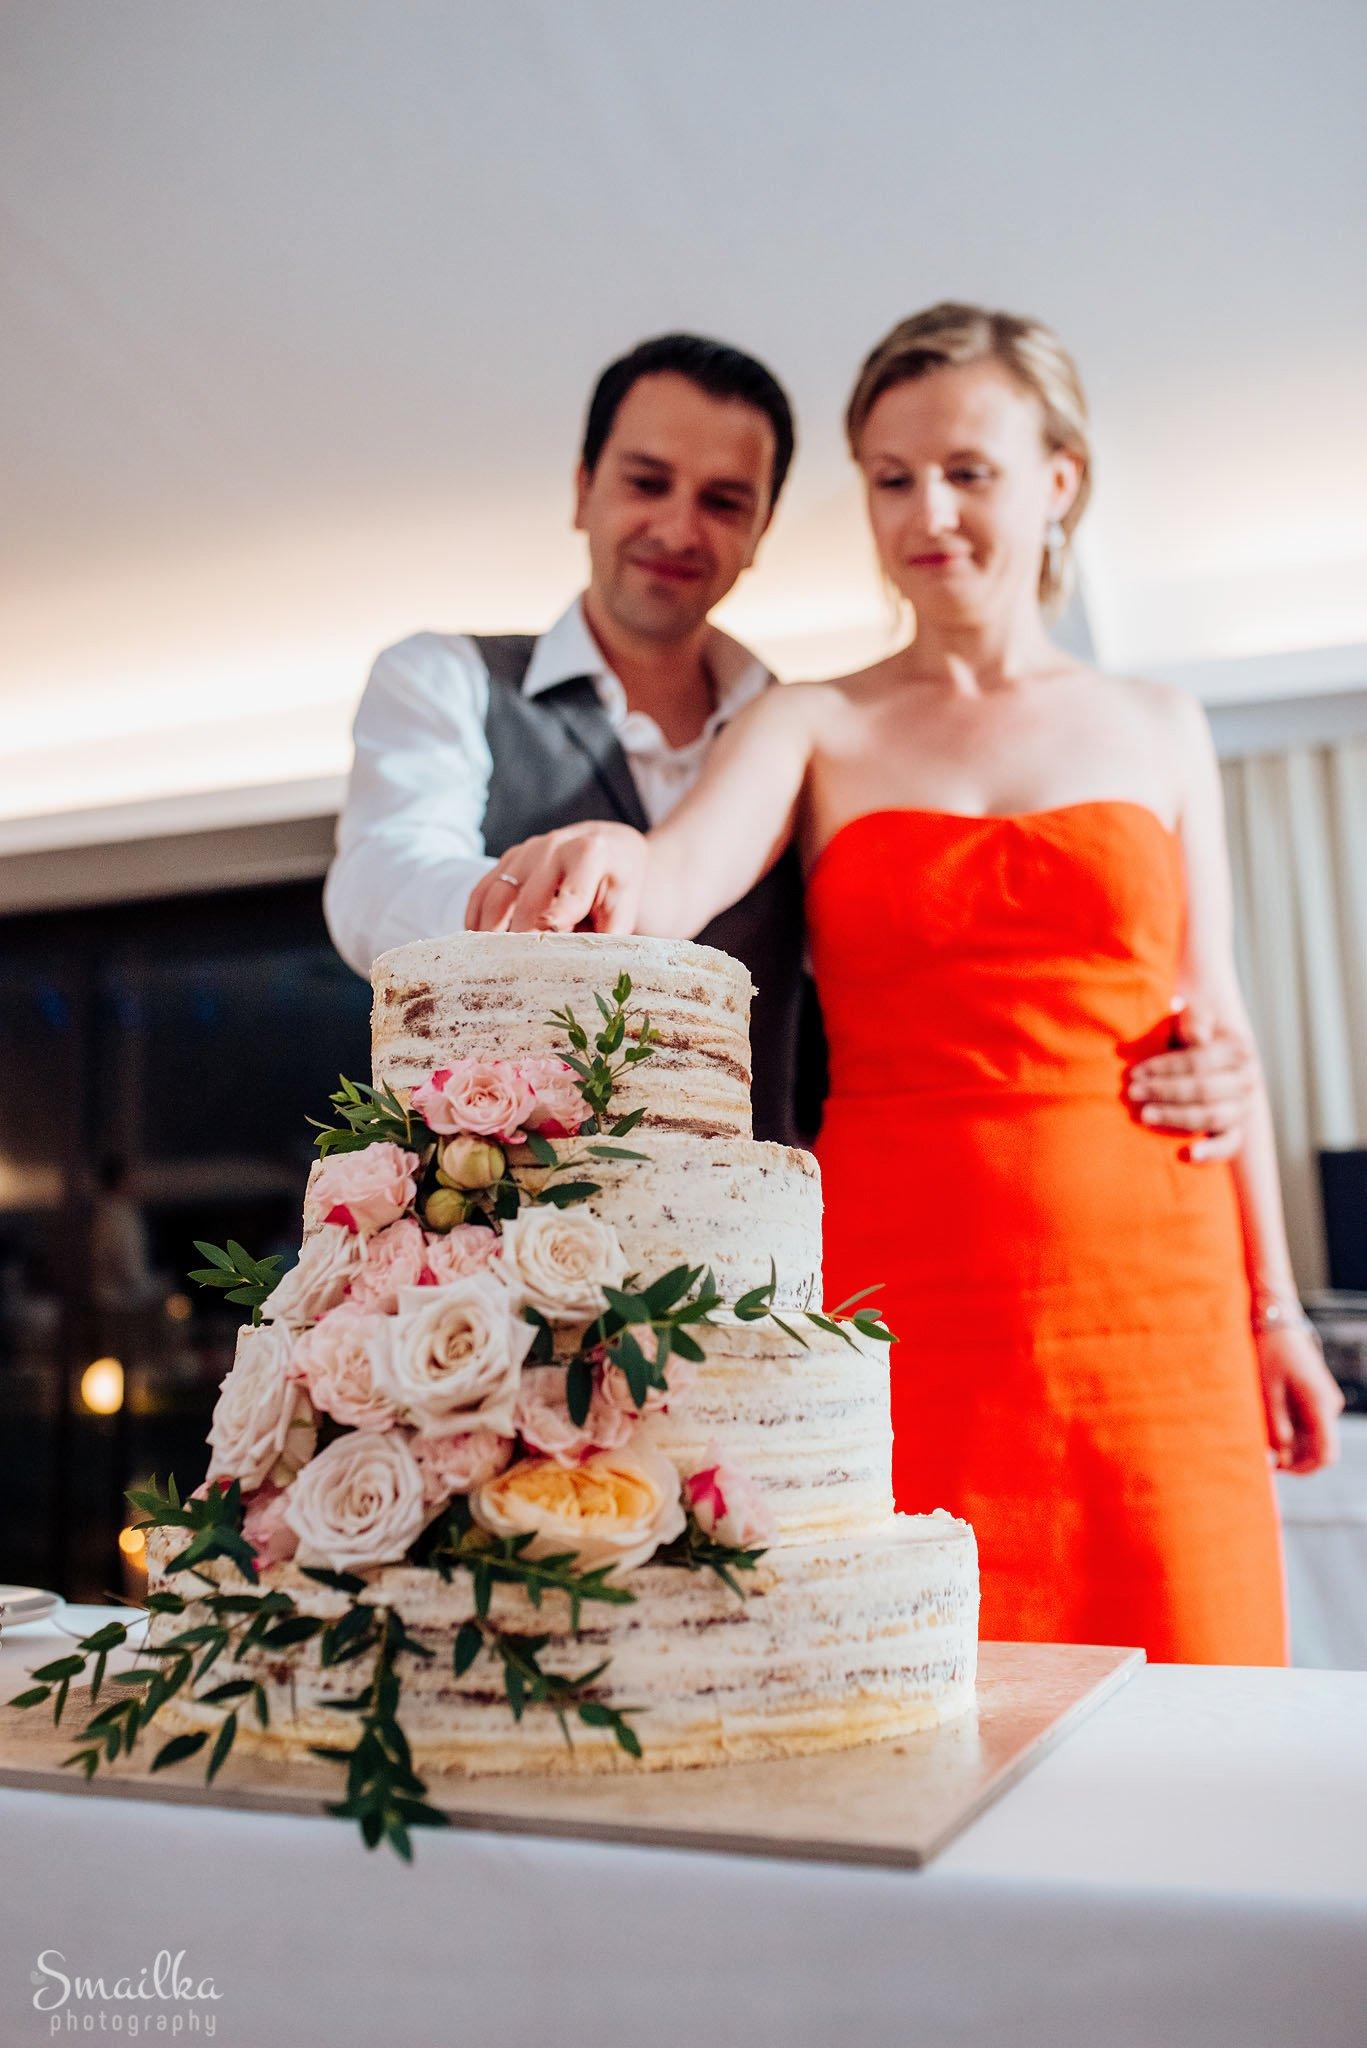 Wedding couple cutting the wedding cake